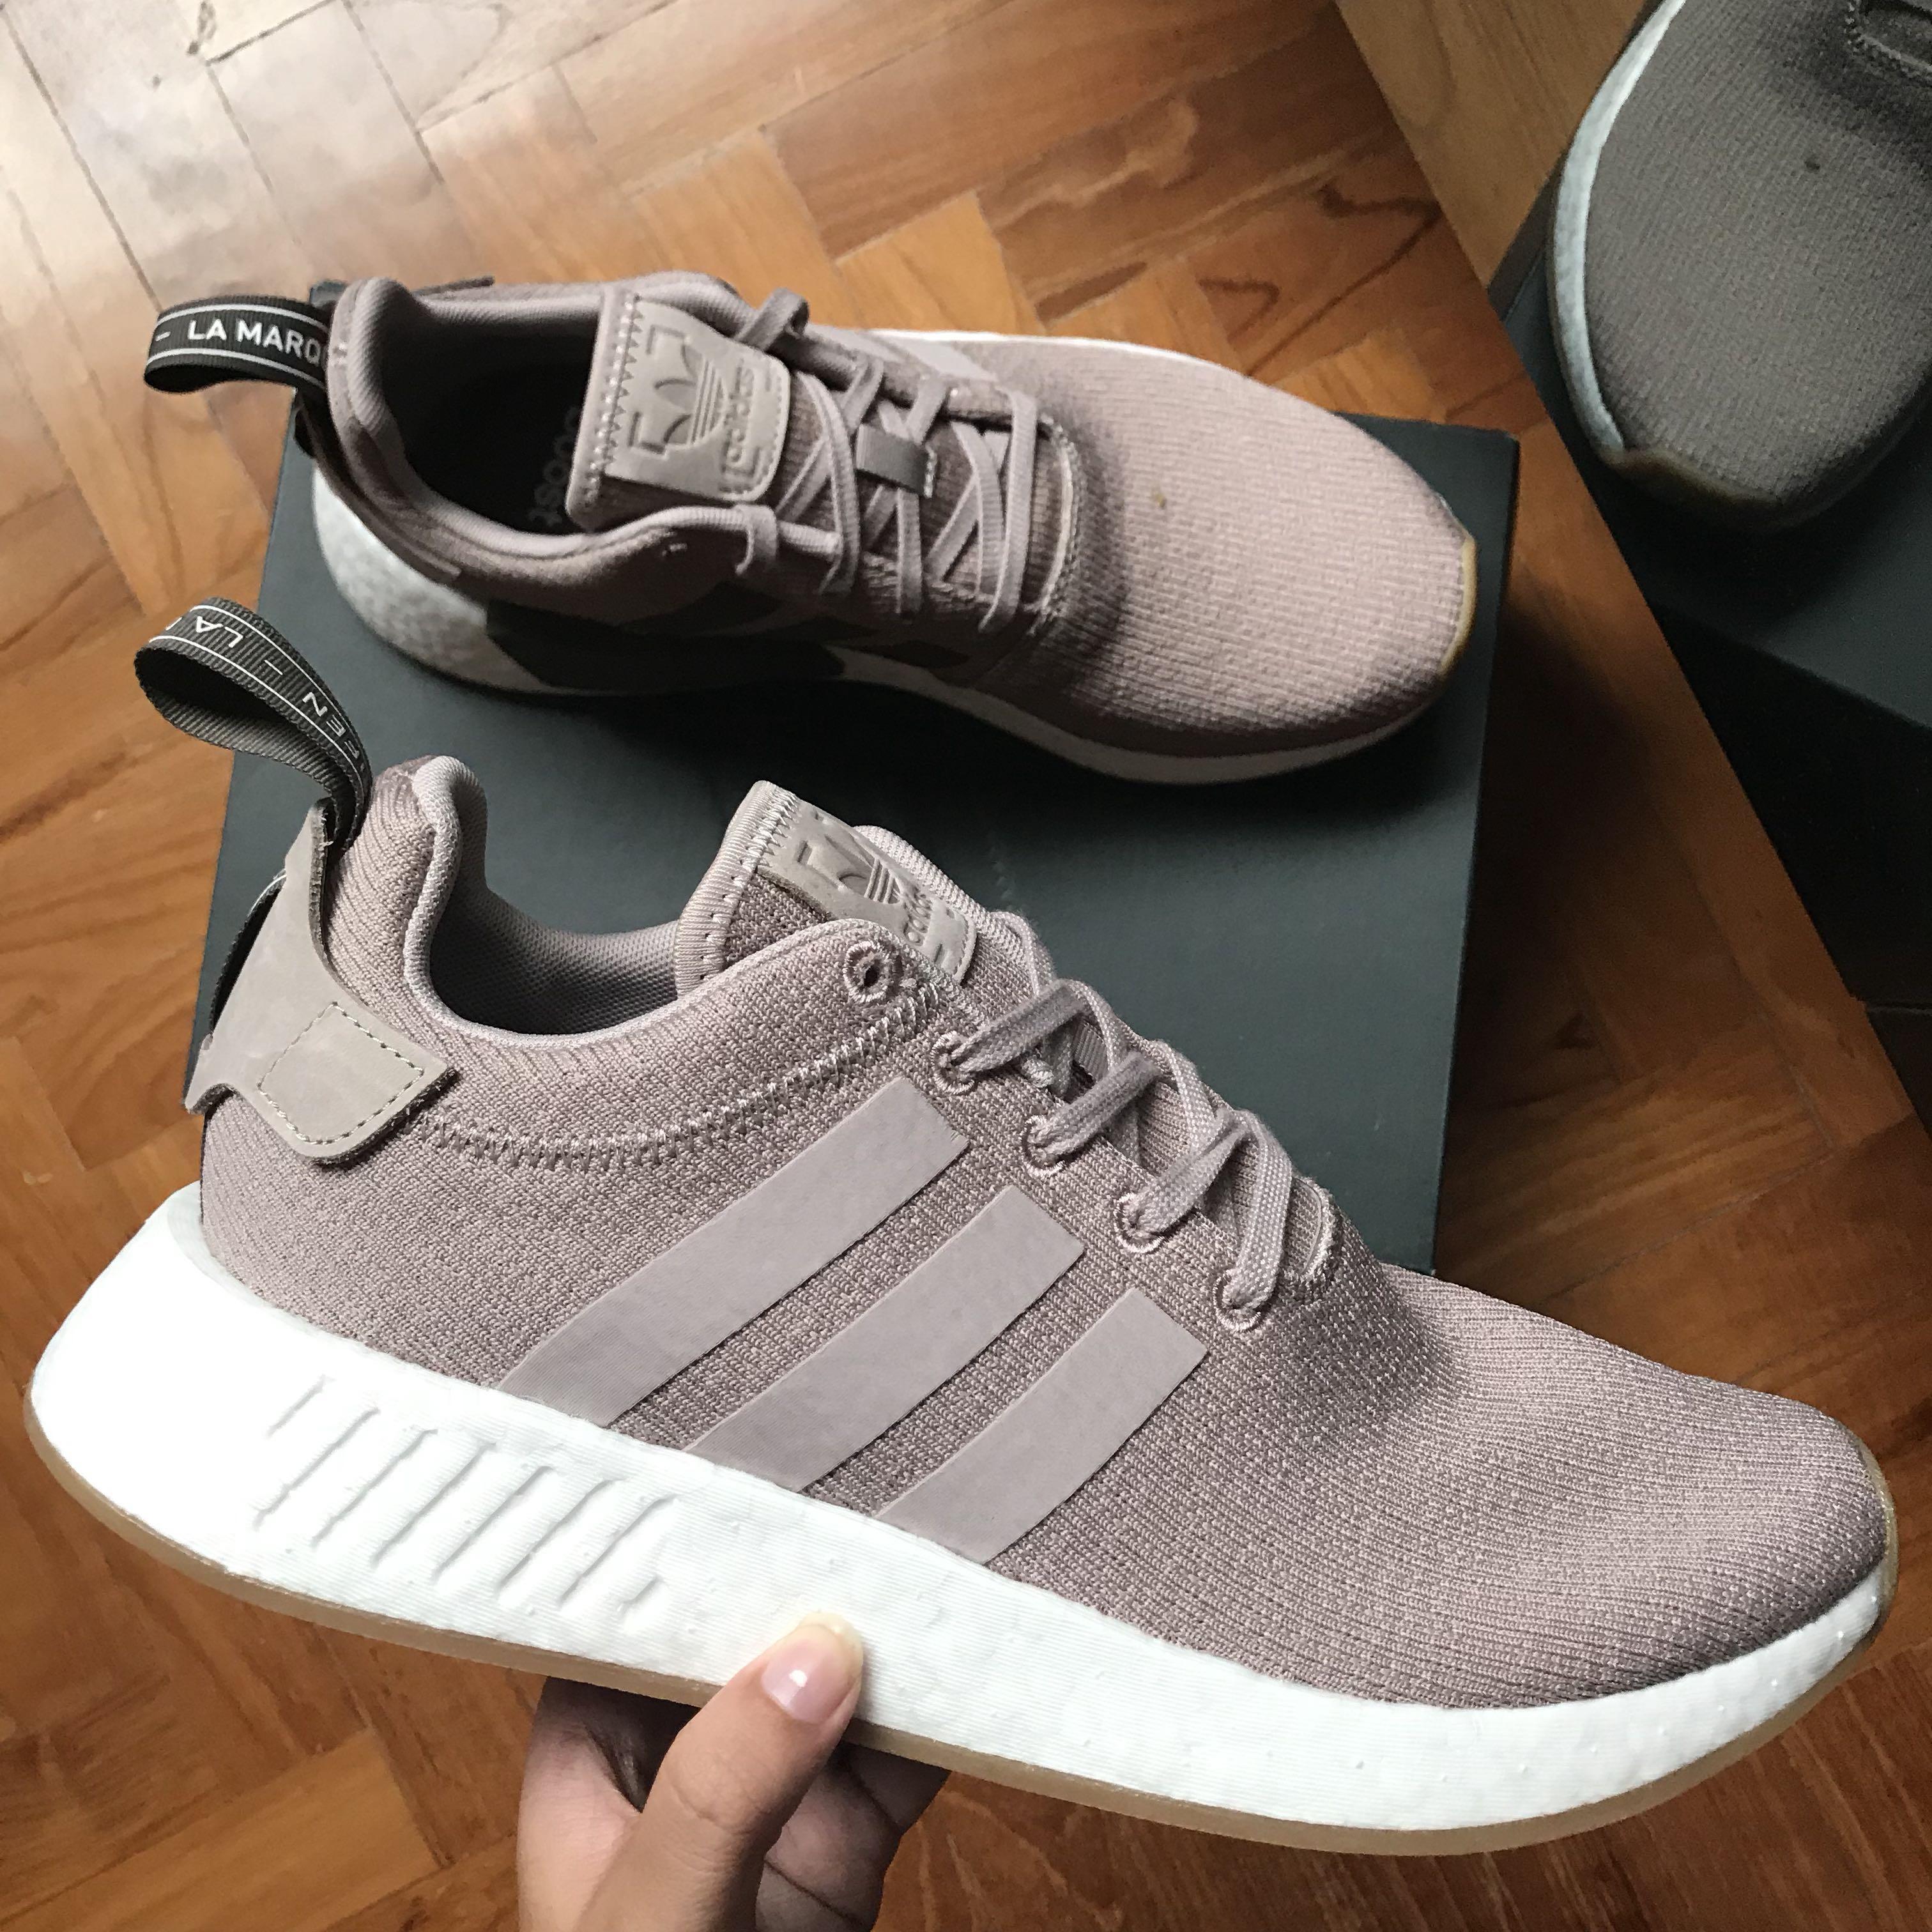 e85848ab3b4d8 under retail!) Adidas NMD R2 Grey Beige Brown